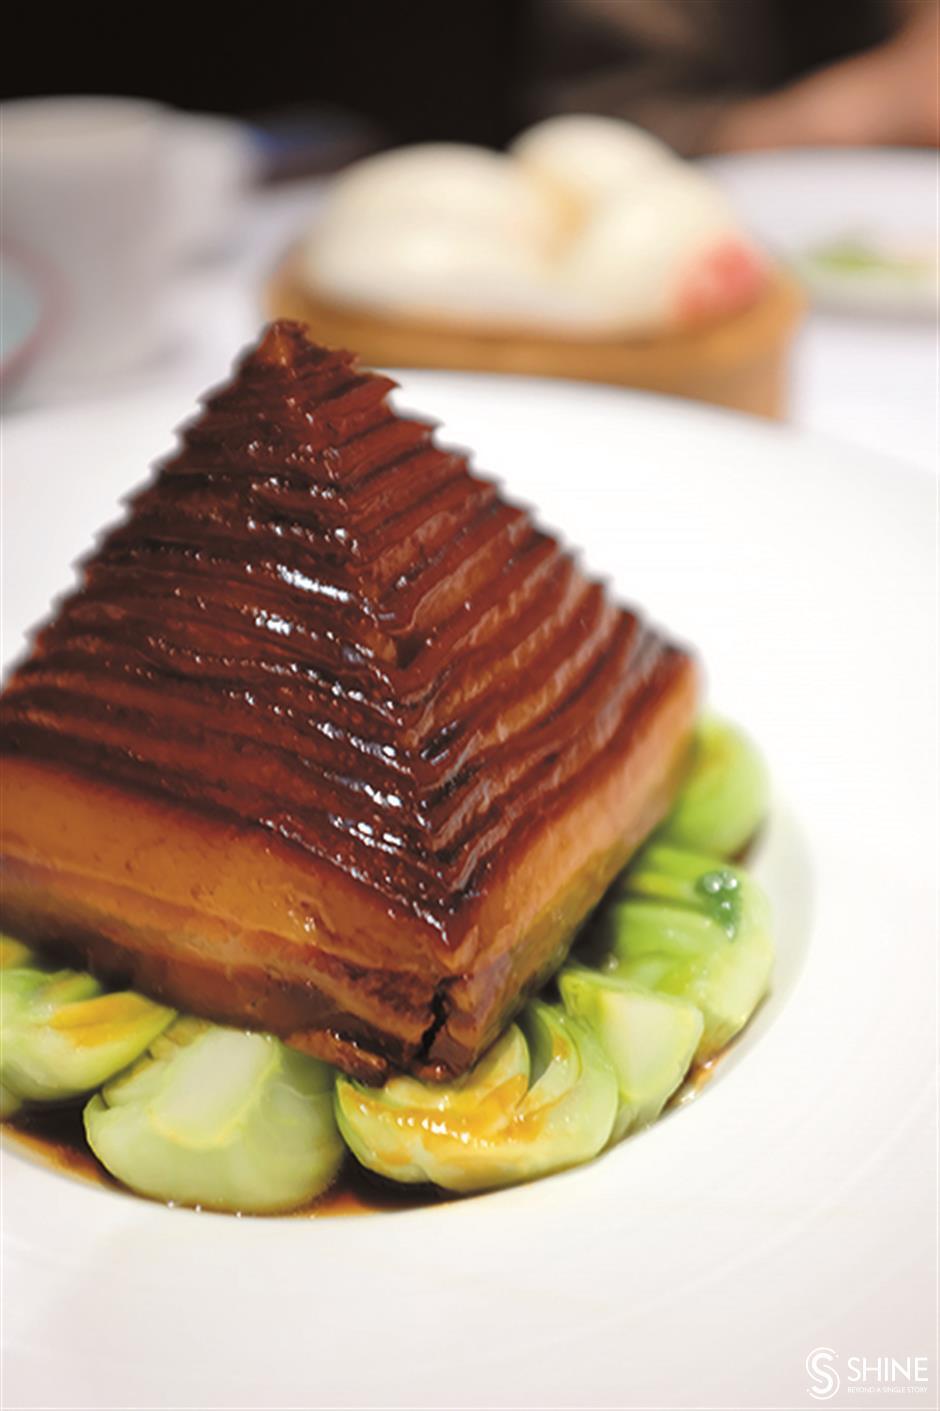 Classic Hangzhou fare wrapped in nostalgia